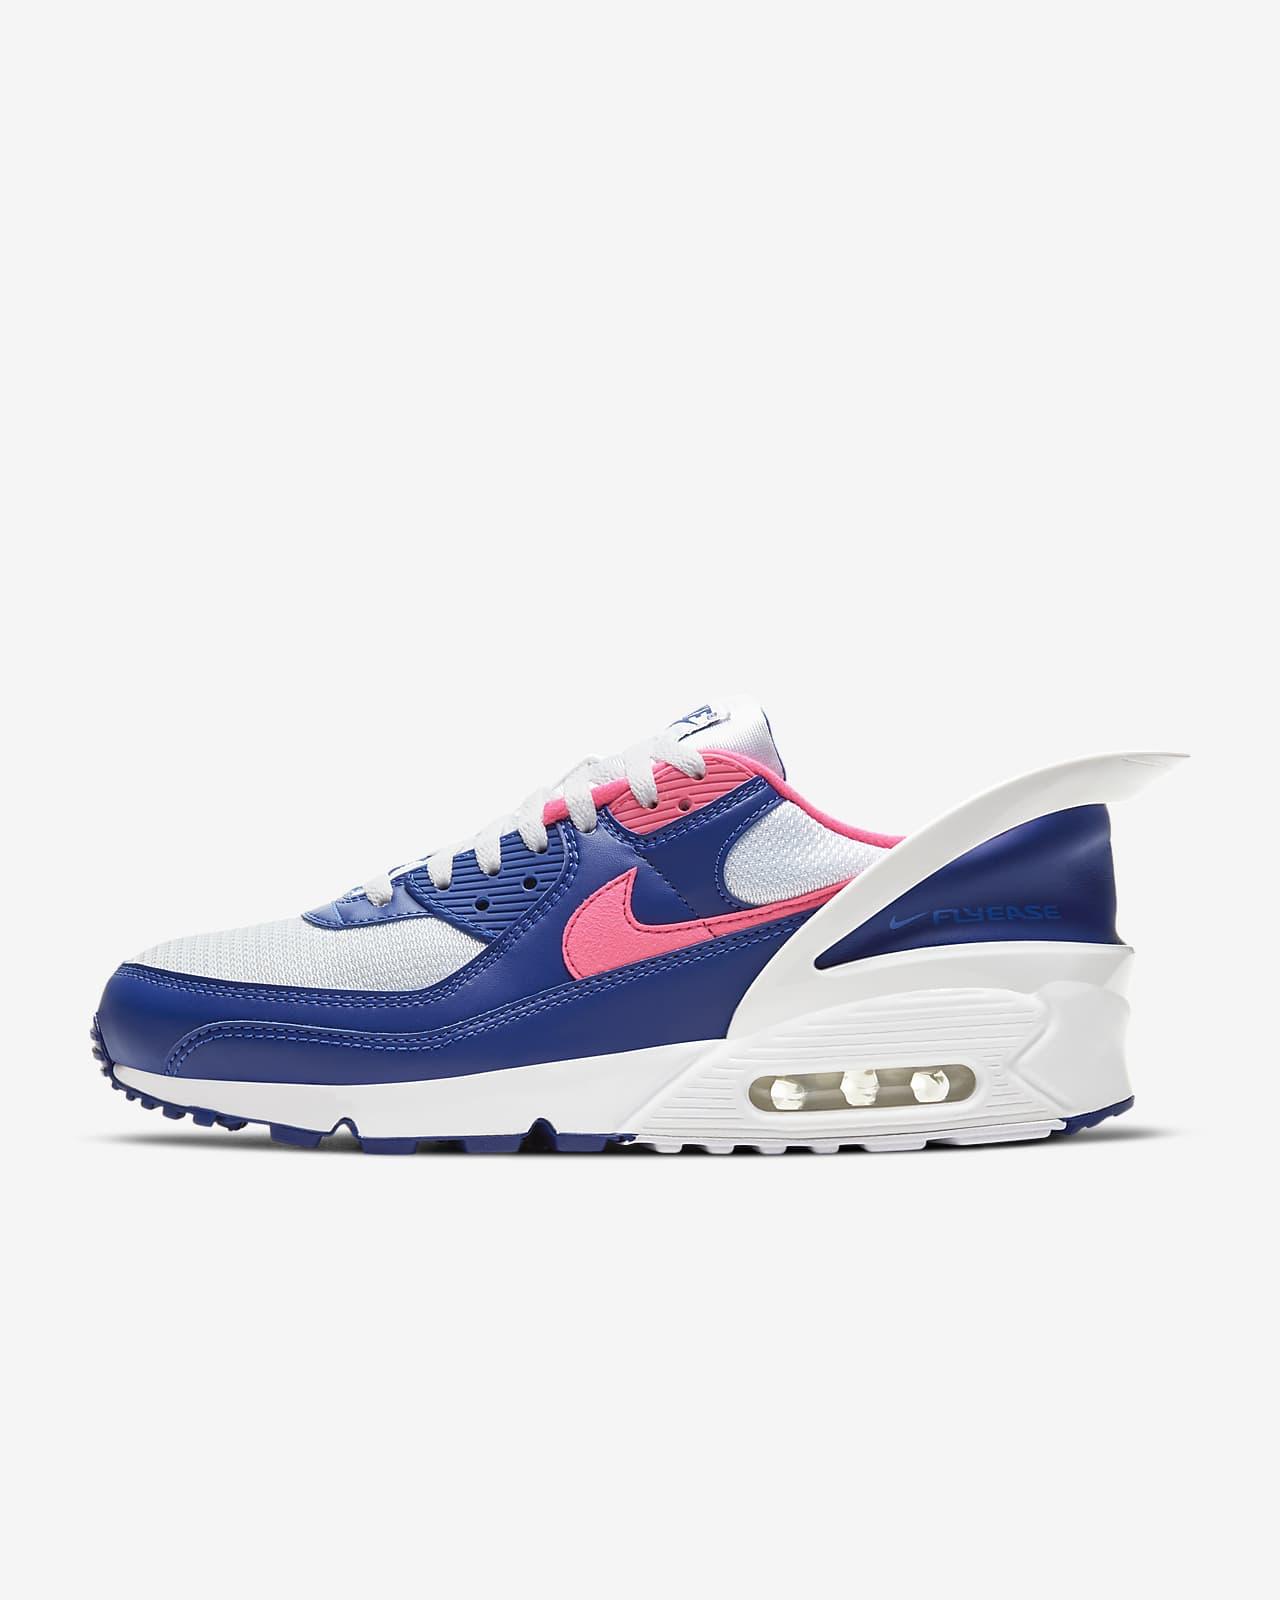 Nike Air Max 90 FlyEase Shoe. Nike AT